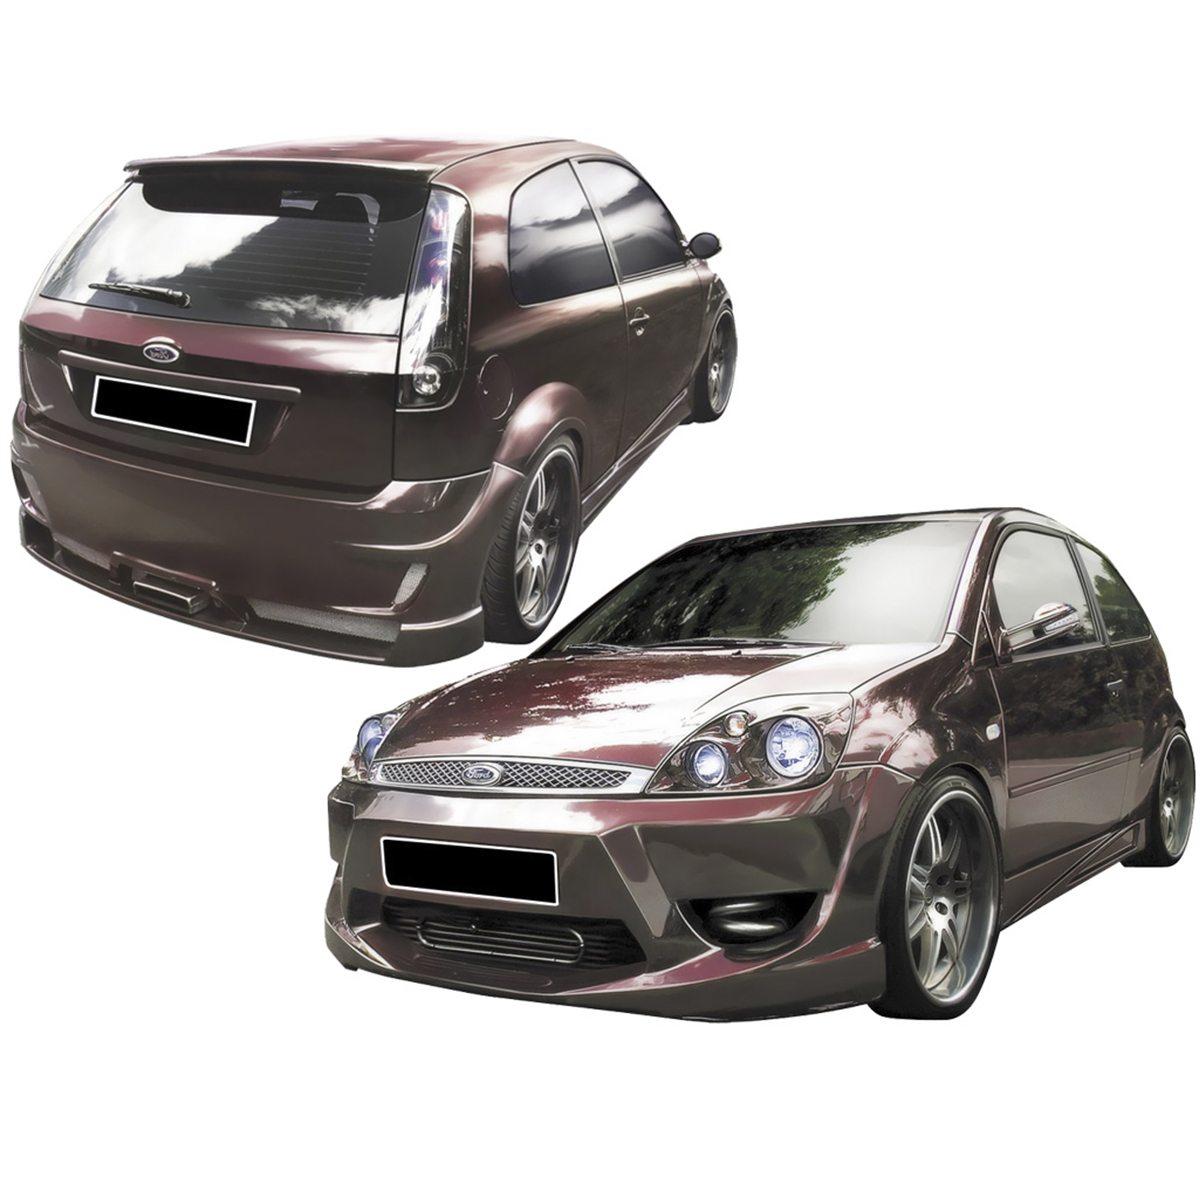 Ford-Fiesta-02-Slave-KIT-KTN008